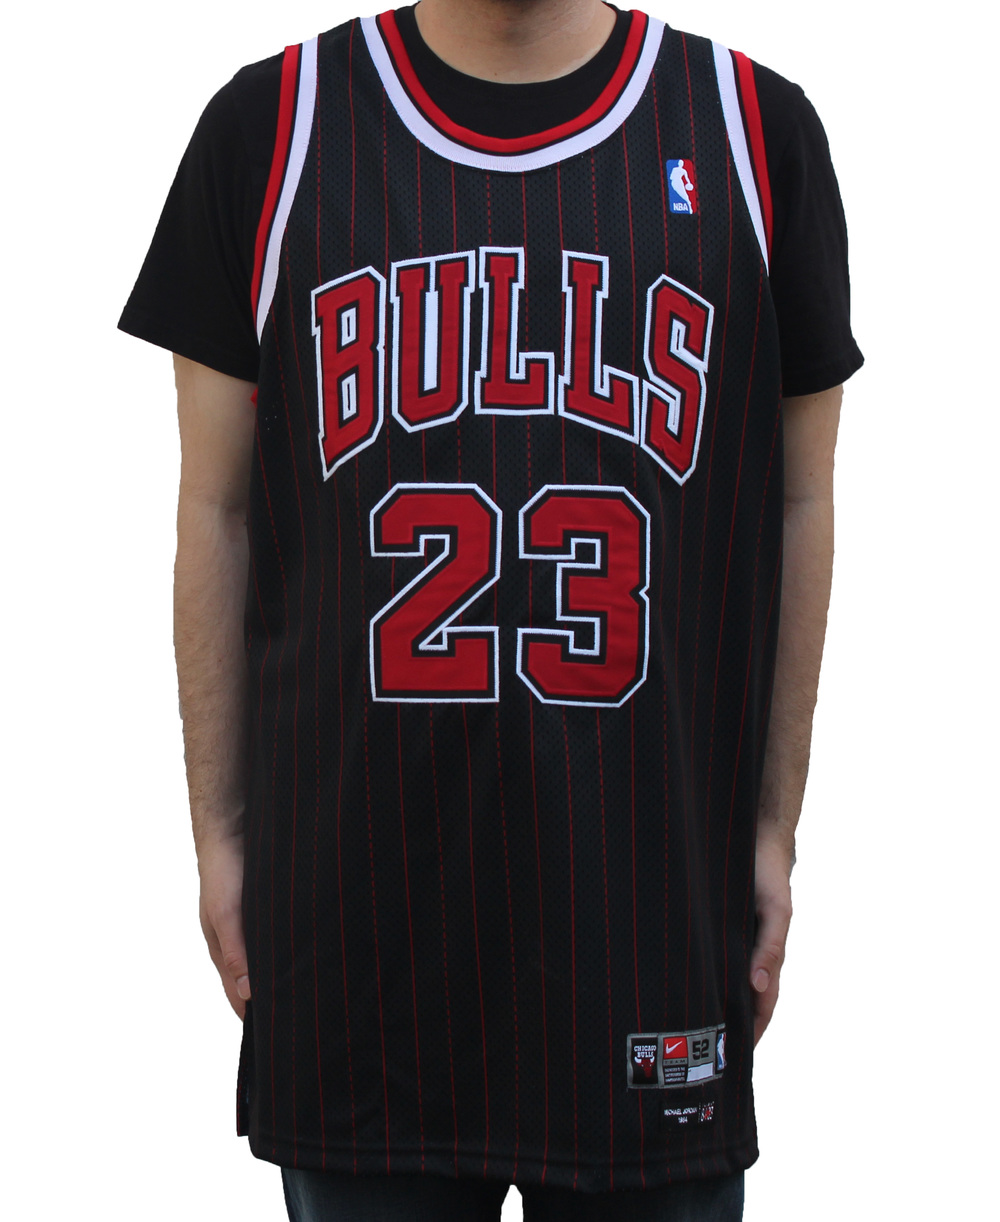 newest 3fa0b c9fb5 discount code for michael jordan chicago bulls jersey 00712 ...